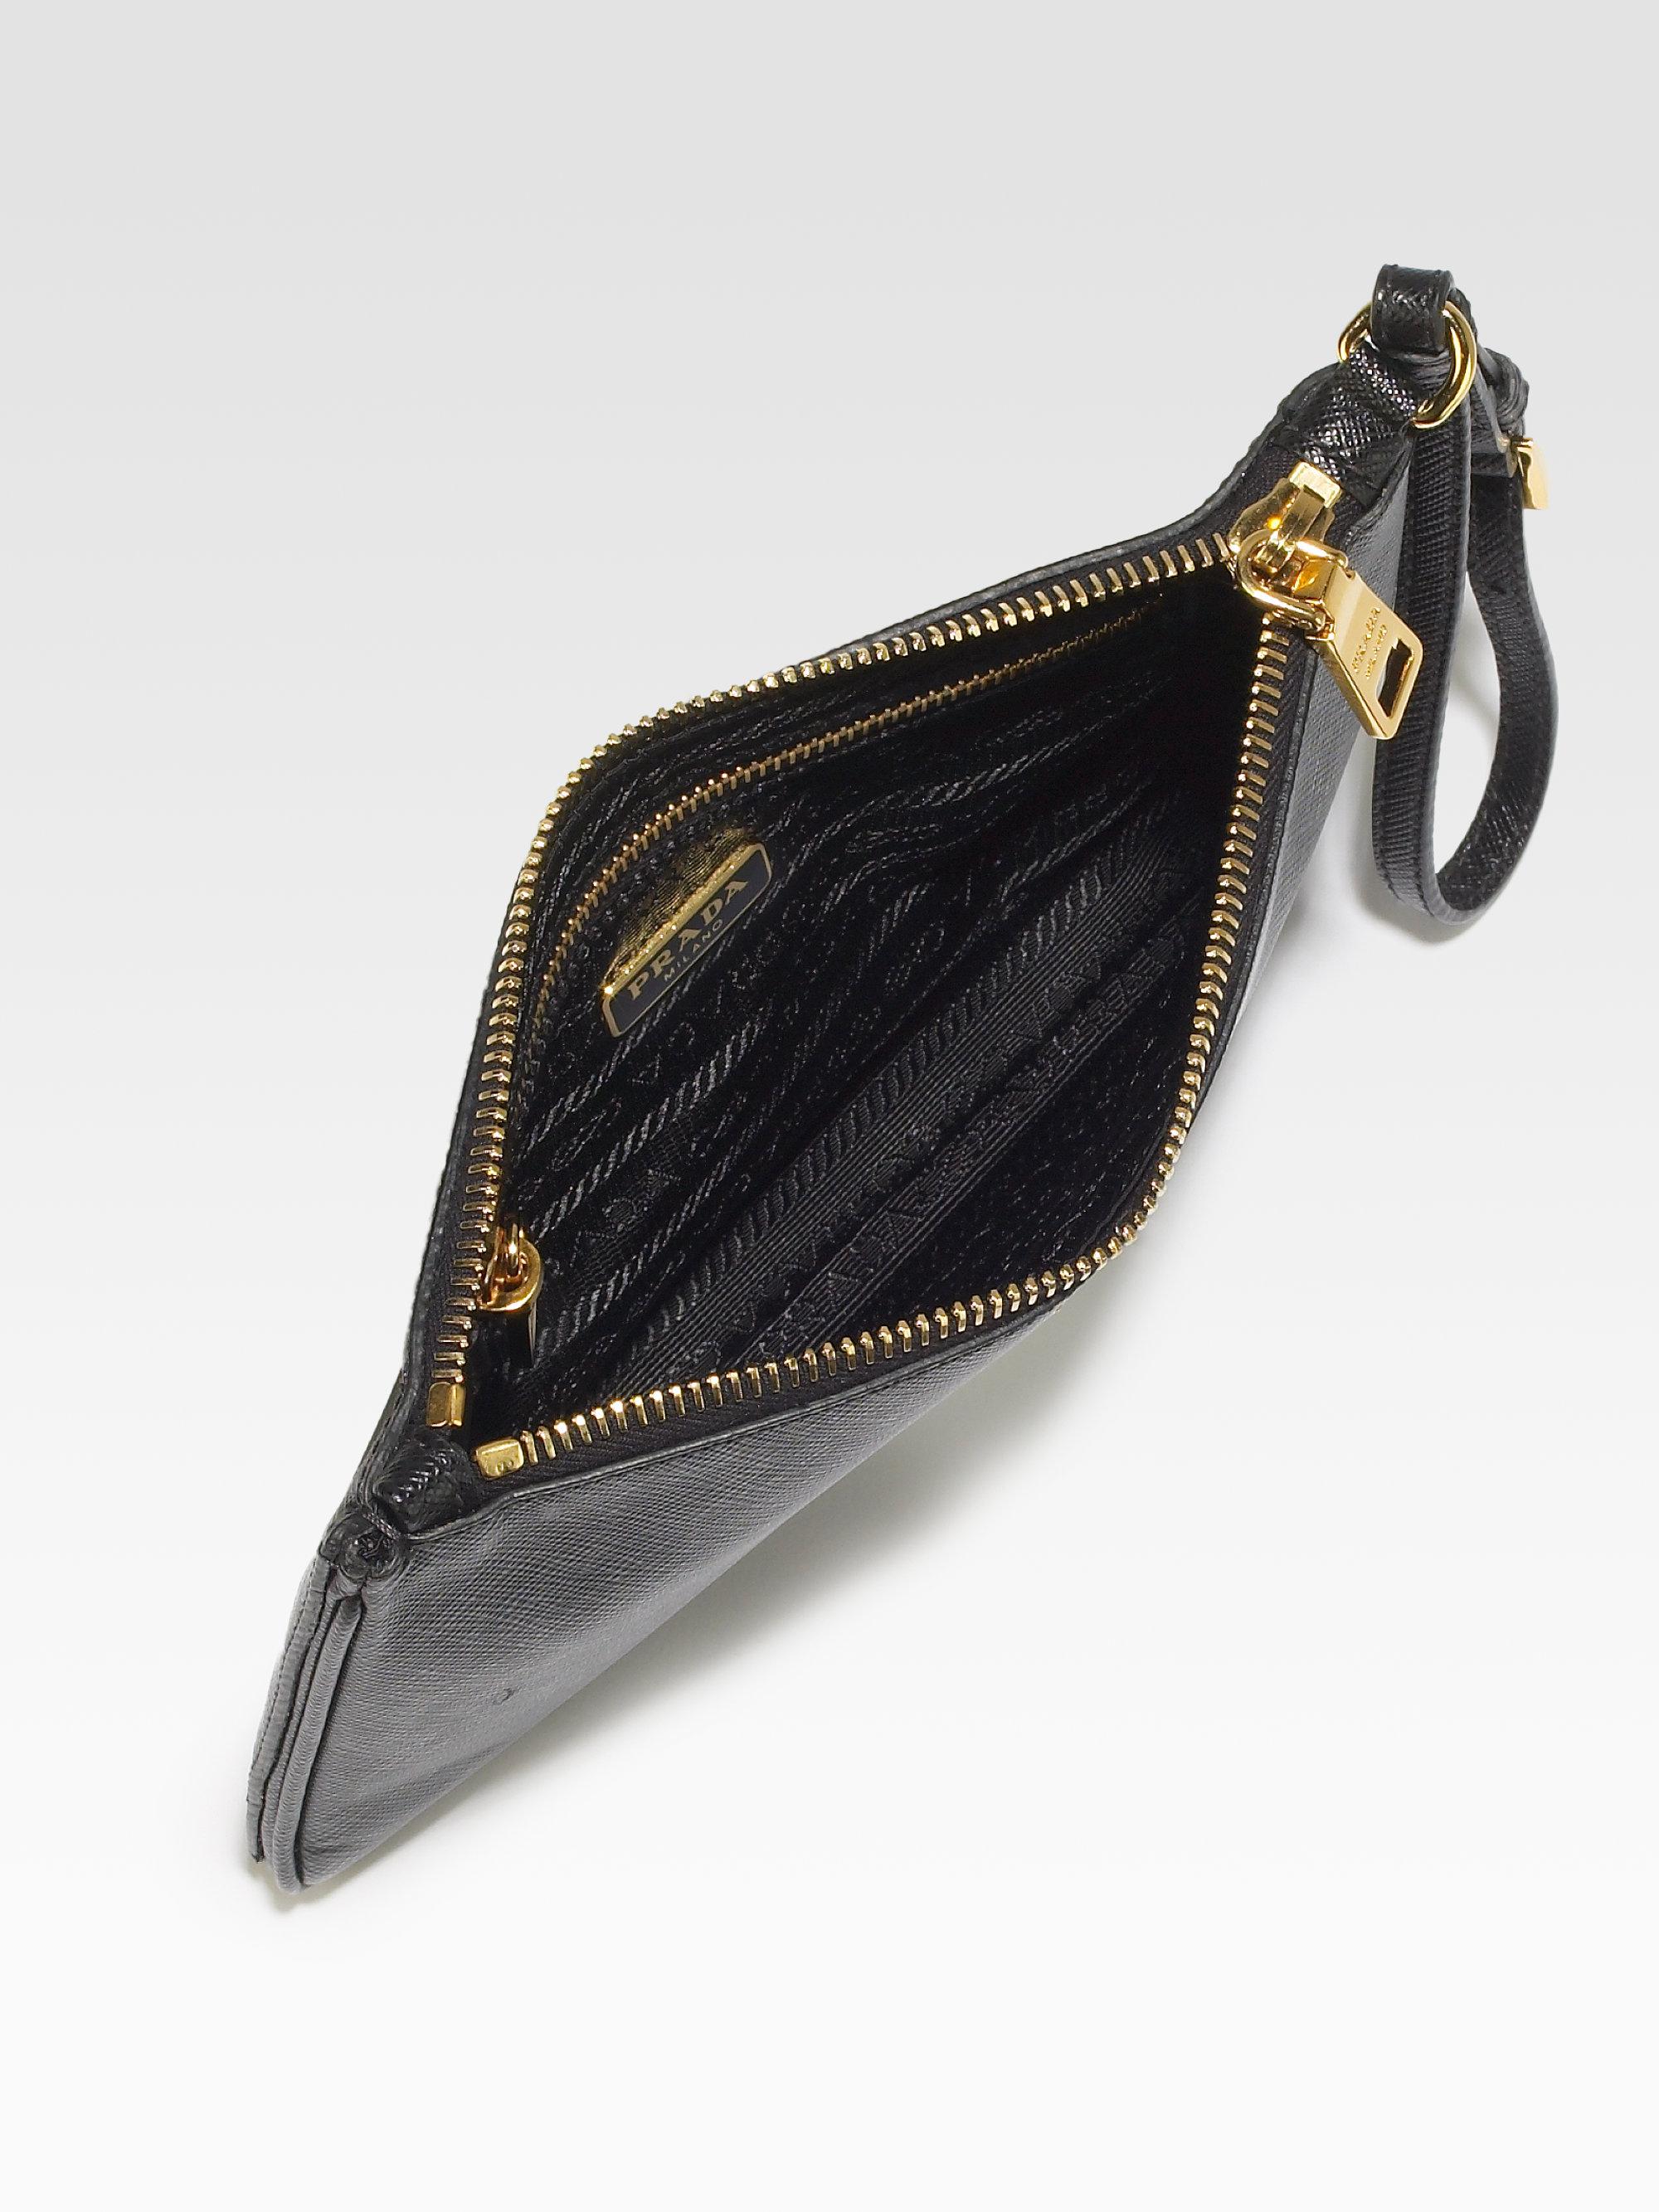 prada satchel handbags - prada braclet wrist bag